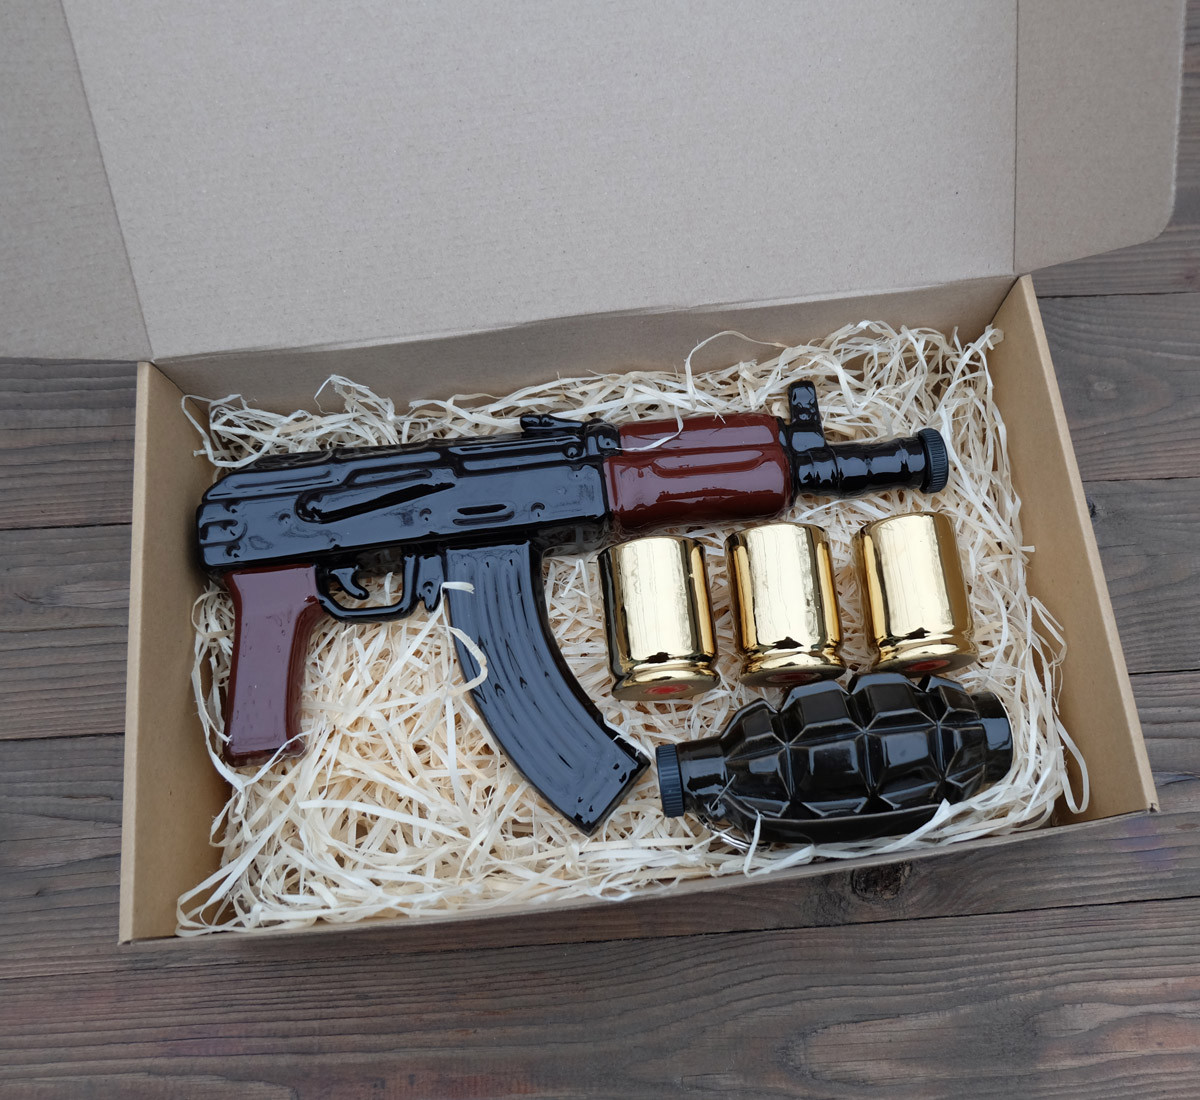 Набор для алкоголя АК, граната Ф1 и рюмки - Бойовий Резерв / Подарок мужчине, военному